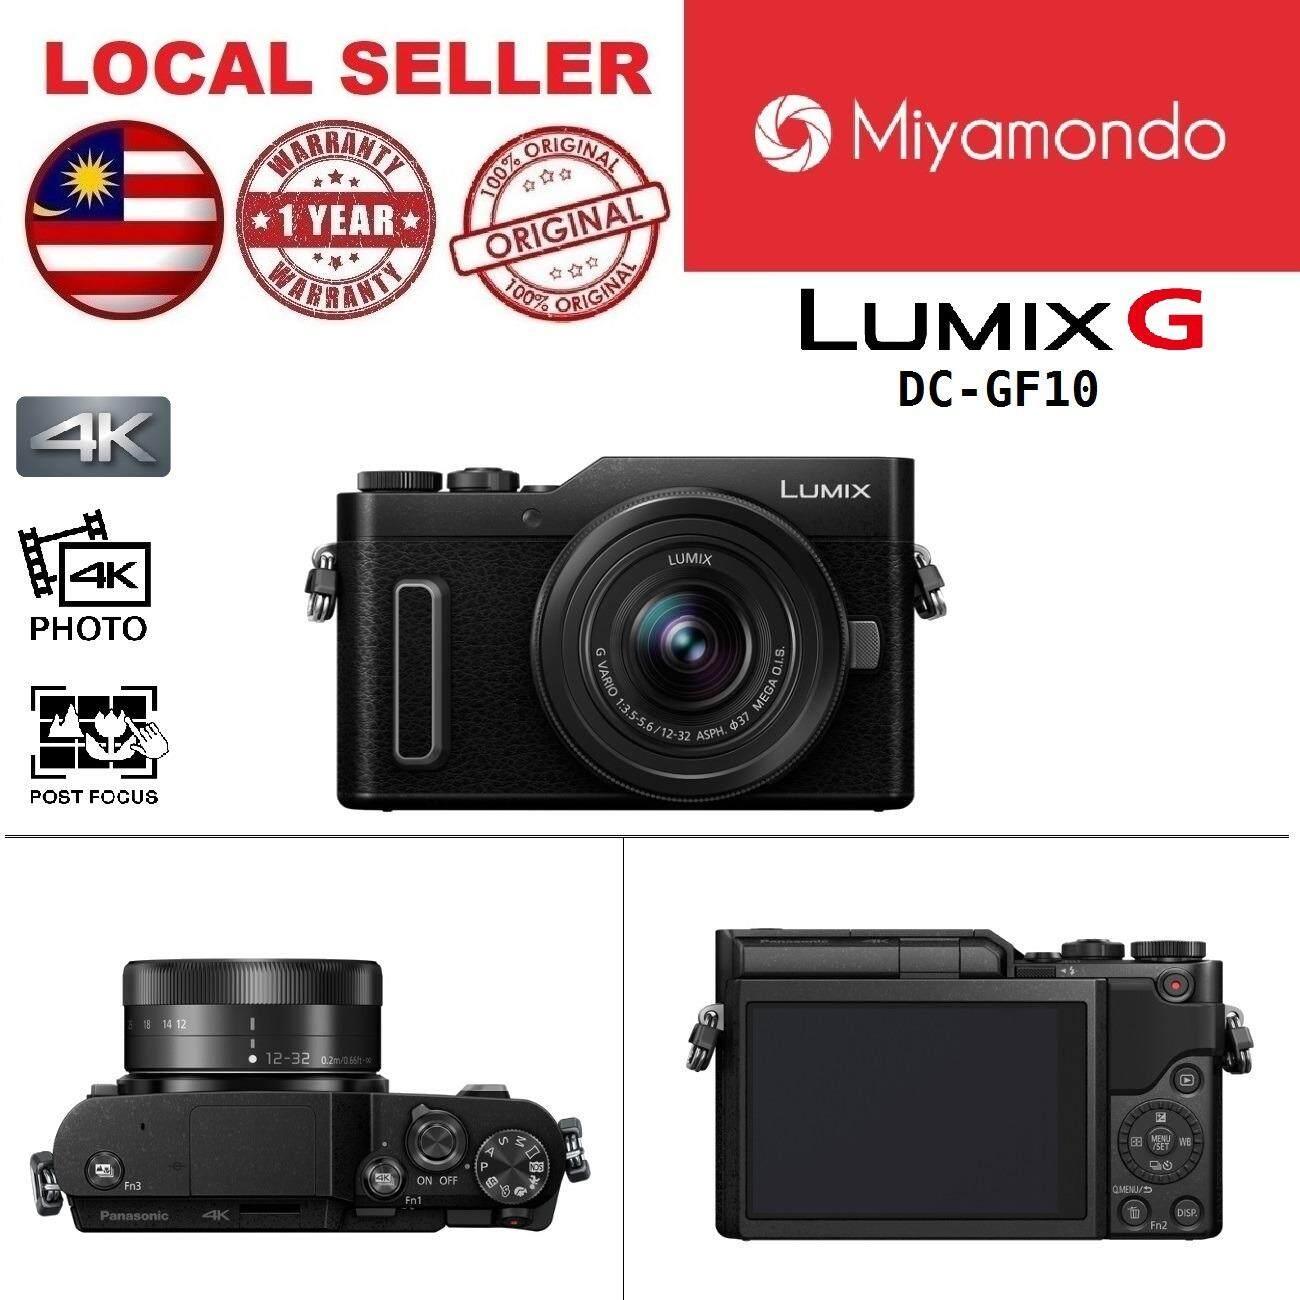 Panasonic Mirrorless Cameras Price In Malaysia Best Lumix Gh5 Body Lens Leica 12mm F 14 Asph Gf10 12 32mm Kit 4k Selfie Camera Black